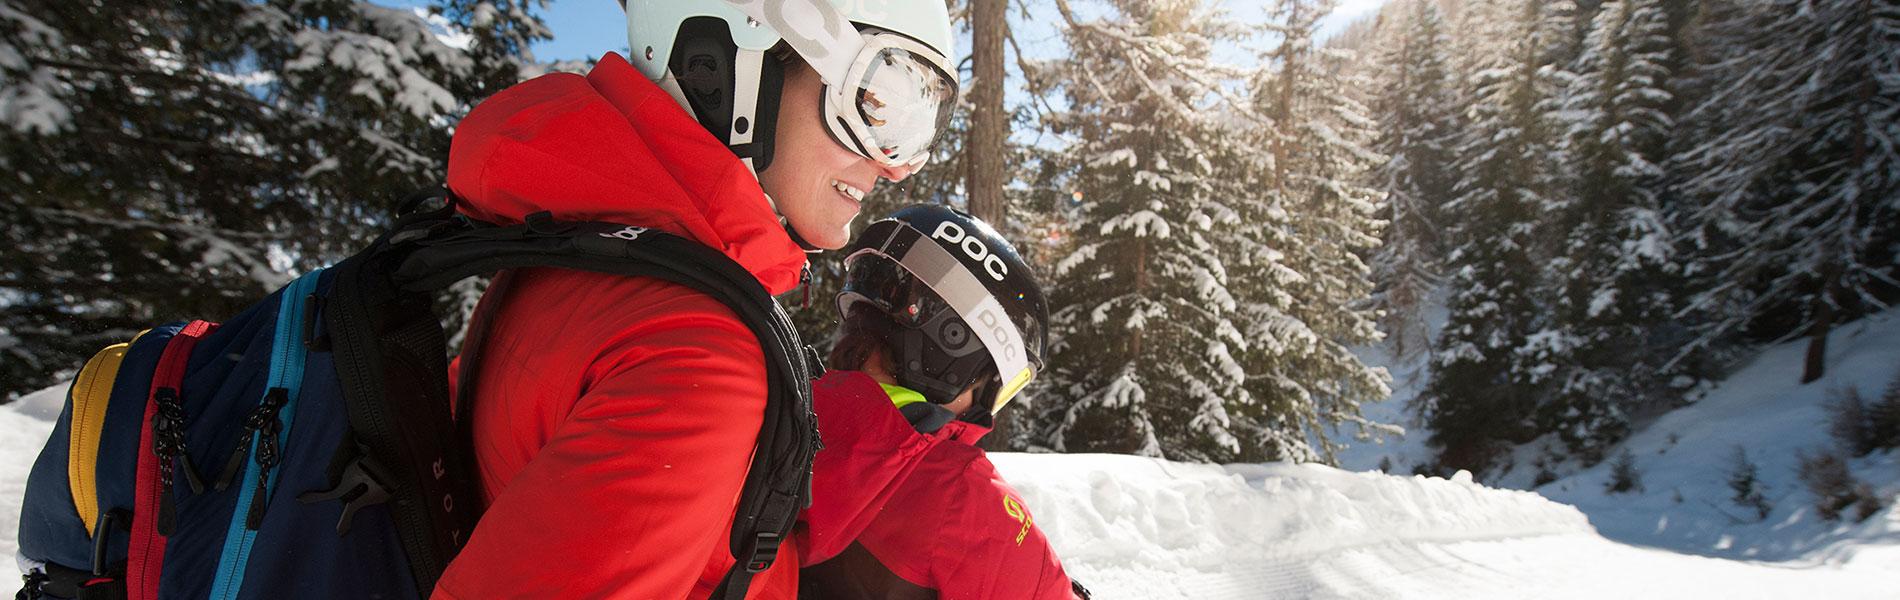 Skiurlaub mit der Familie im Stubaital - 4 Hotel Happy Stubai in Neustift Tirol Austria (2)